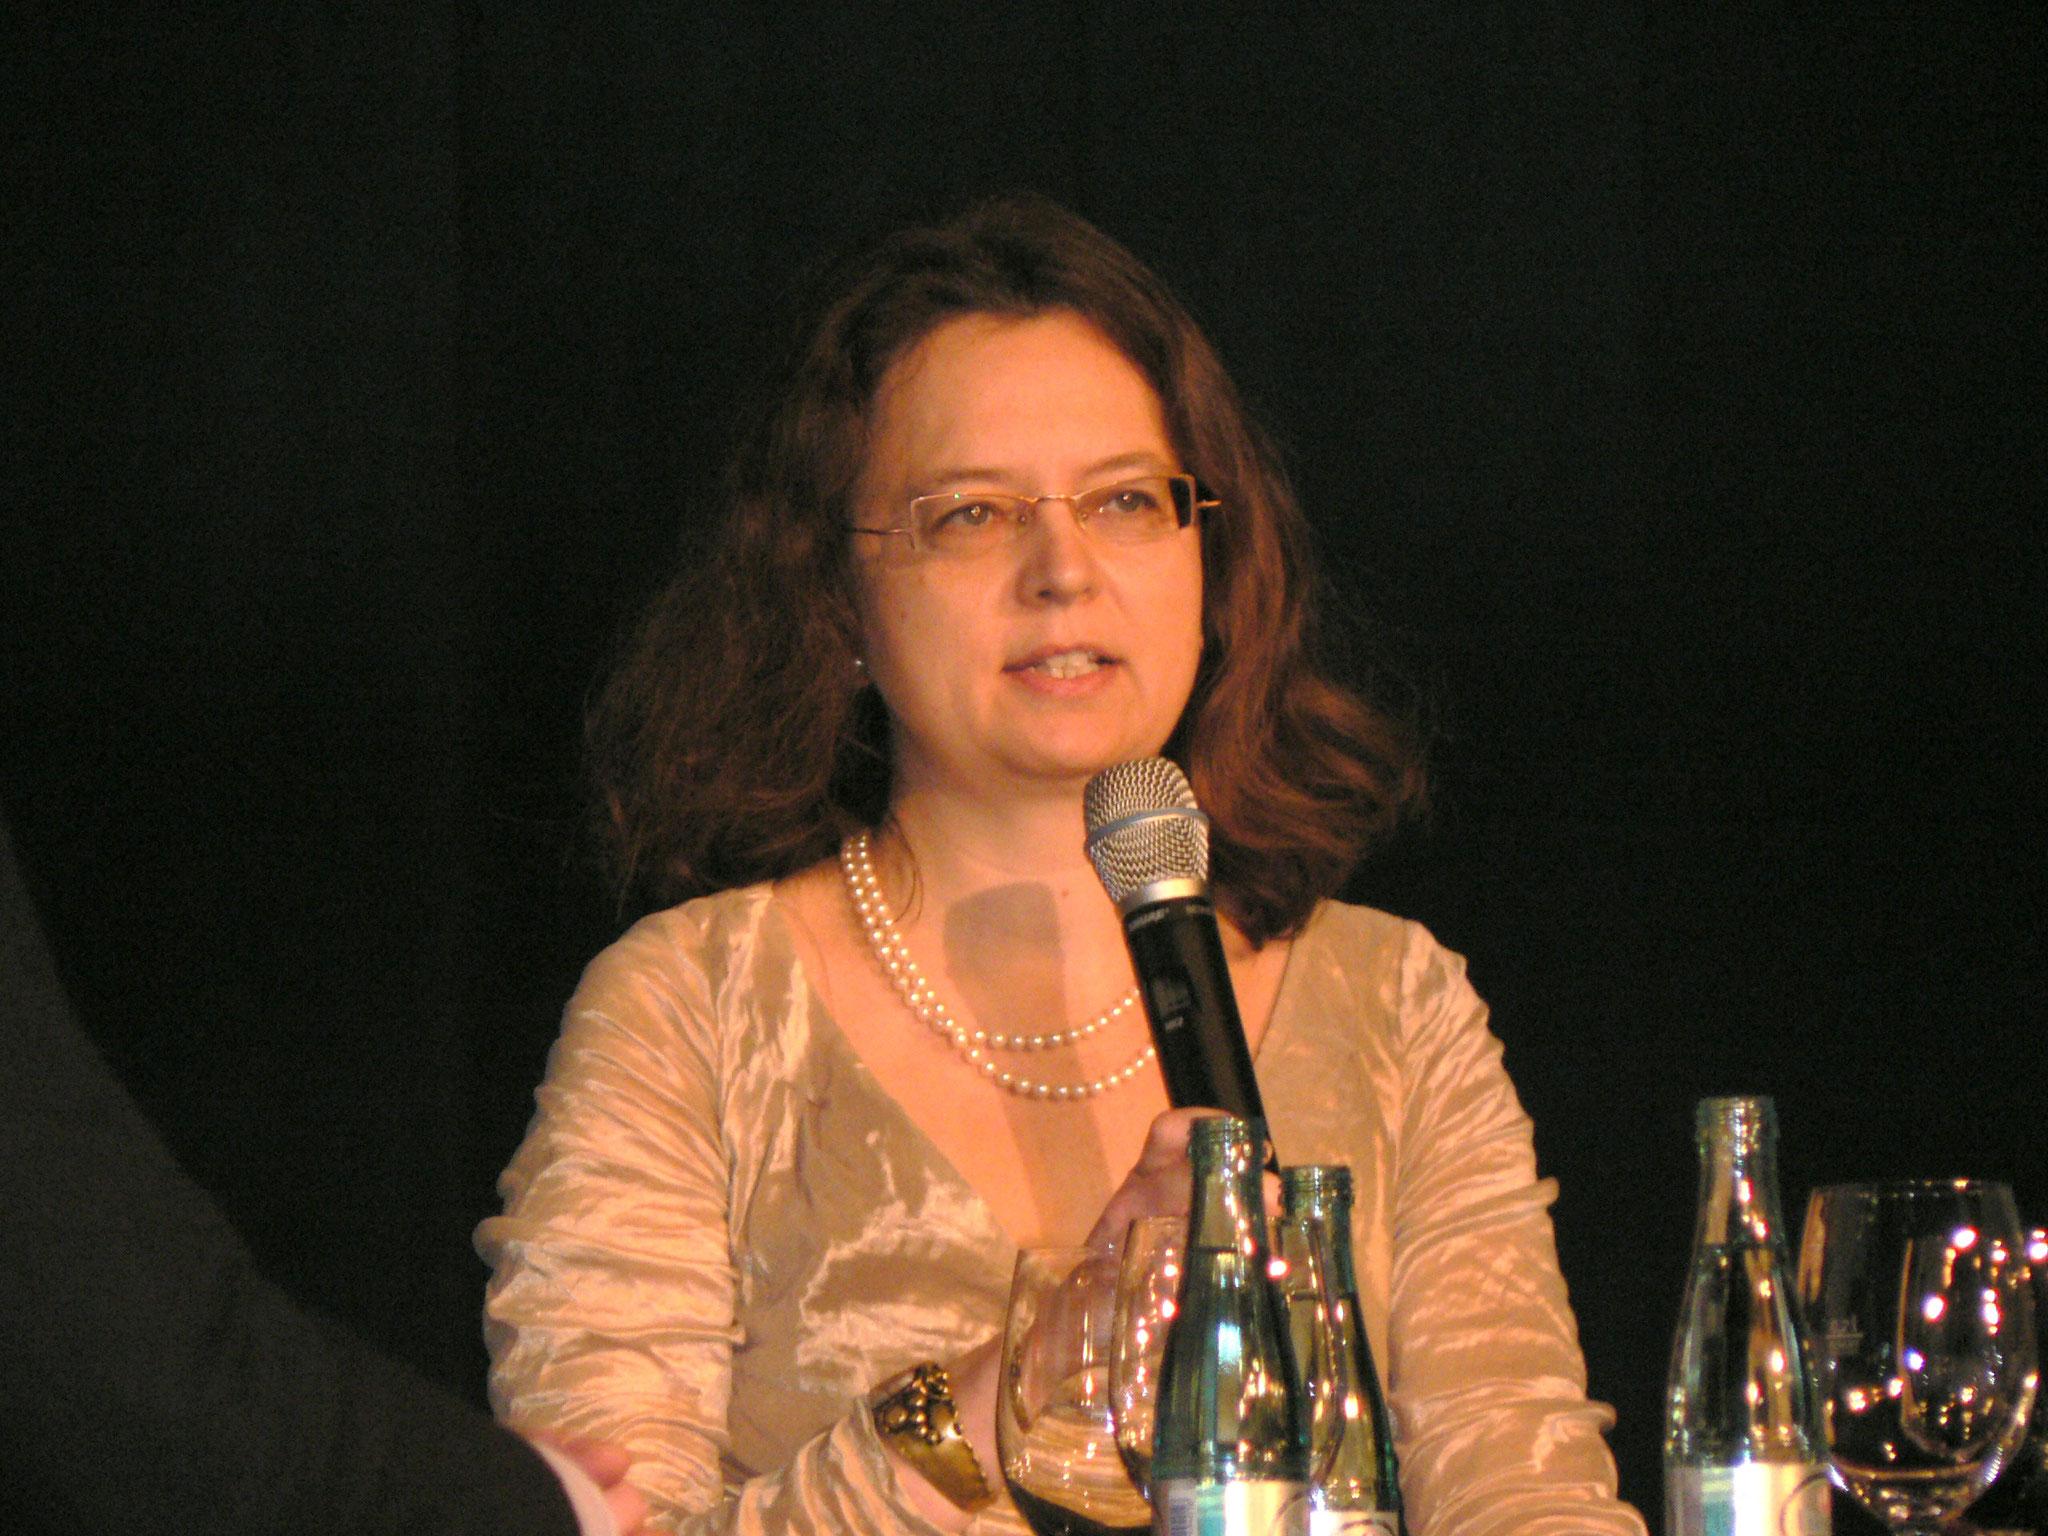 Buchpremiere Schwarzkopf Deutsche Oper Berlin 17.12. 2007